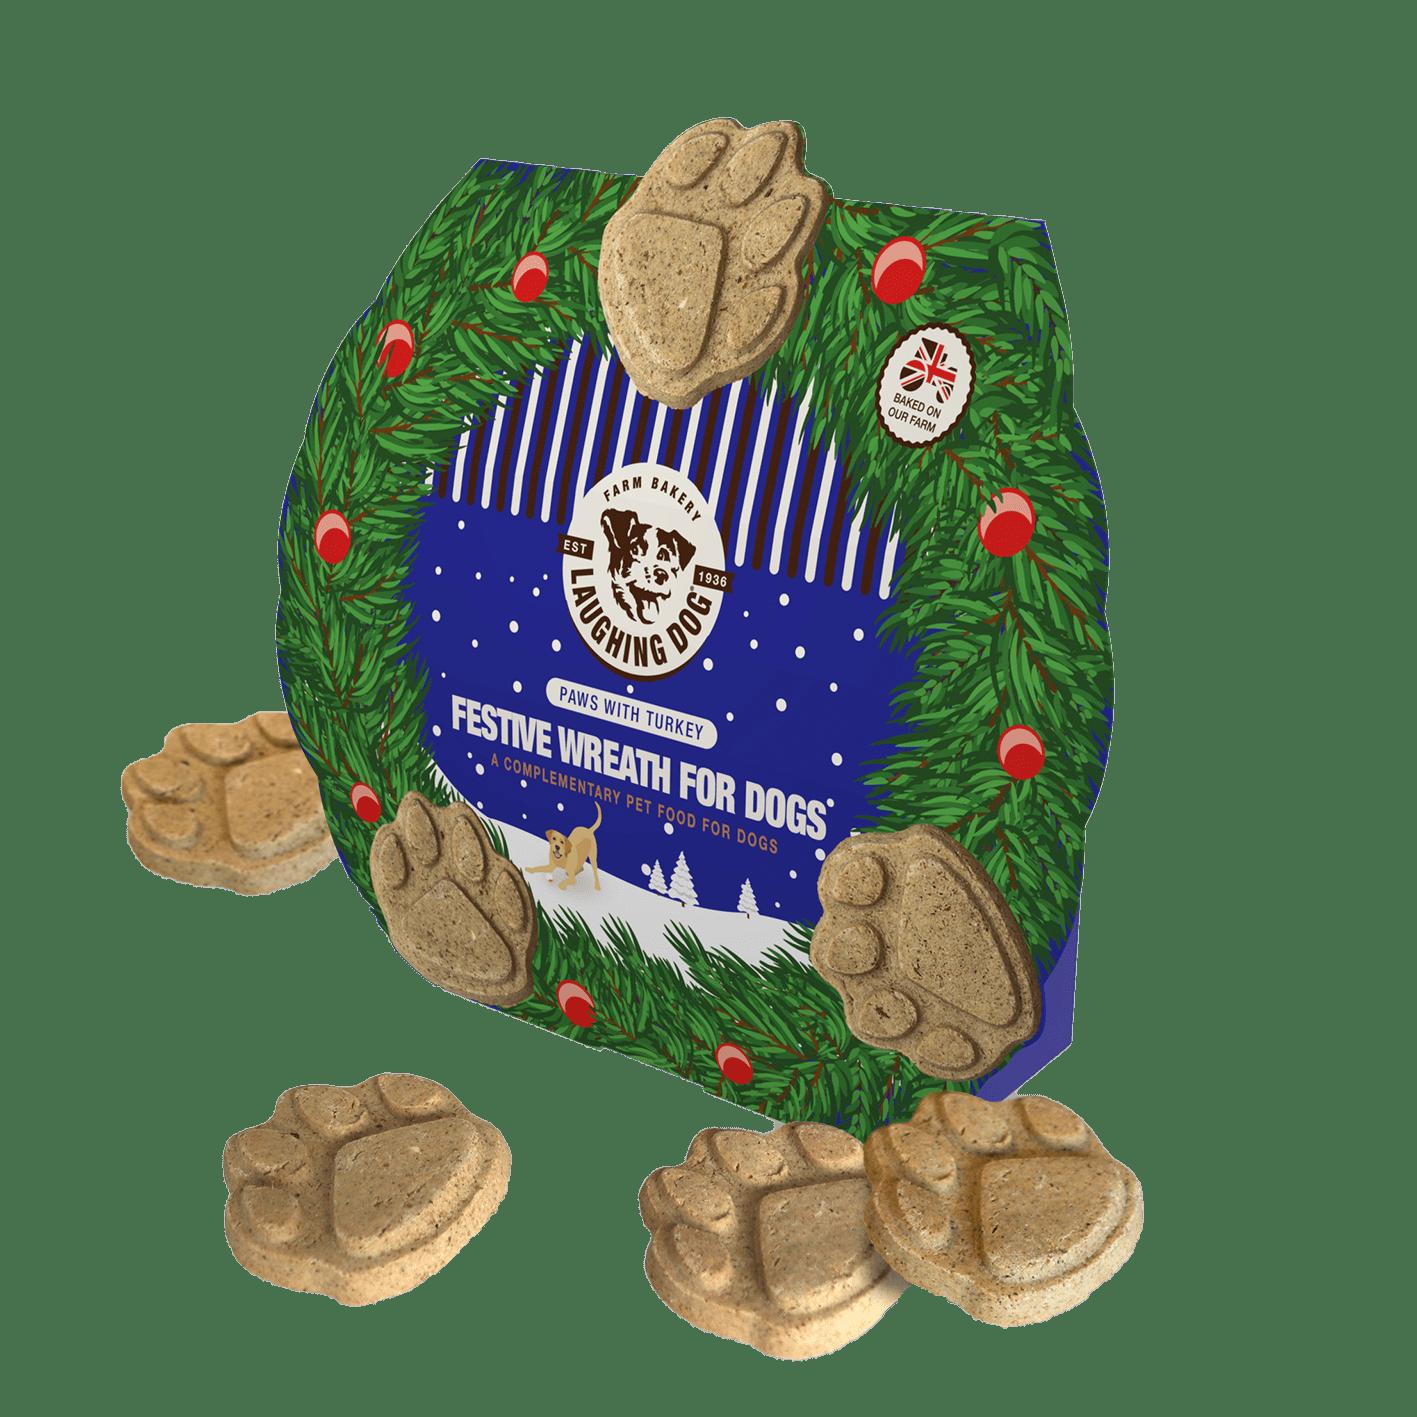 Christmas dog treats - Festive treats for Christmas